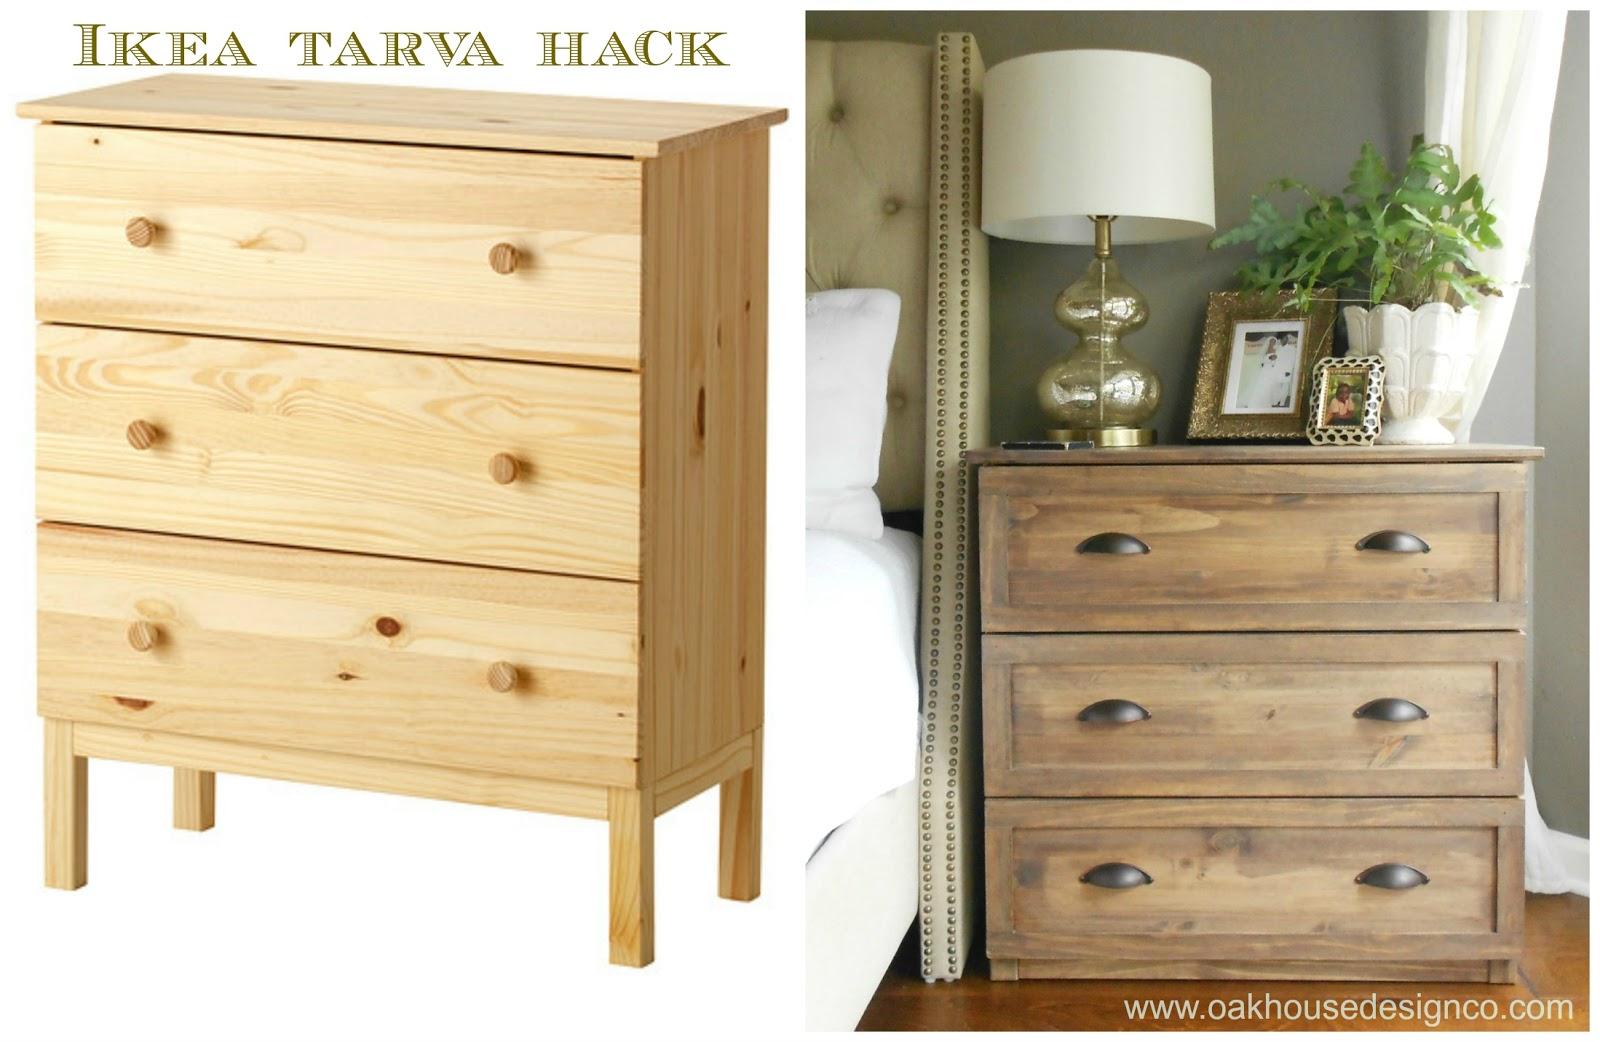 The New Nightstands-An Ikea Tarva Hack - Oak House Design Co.